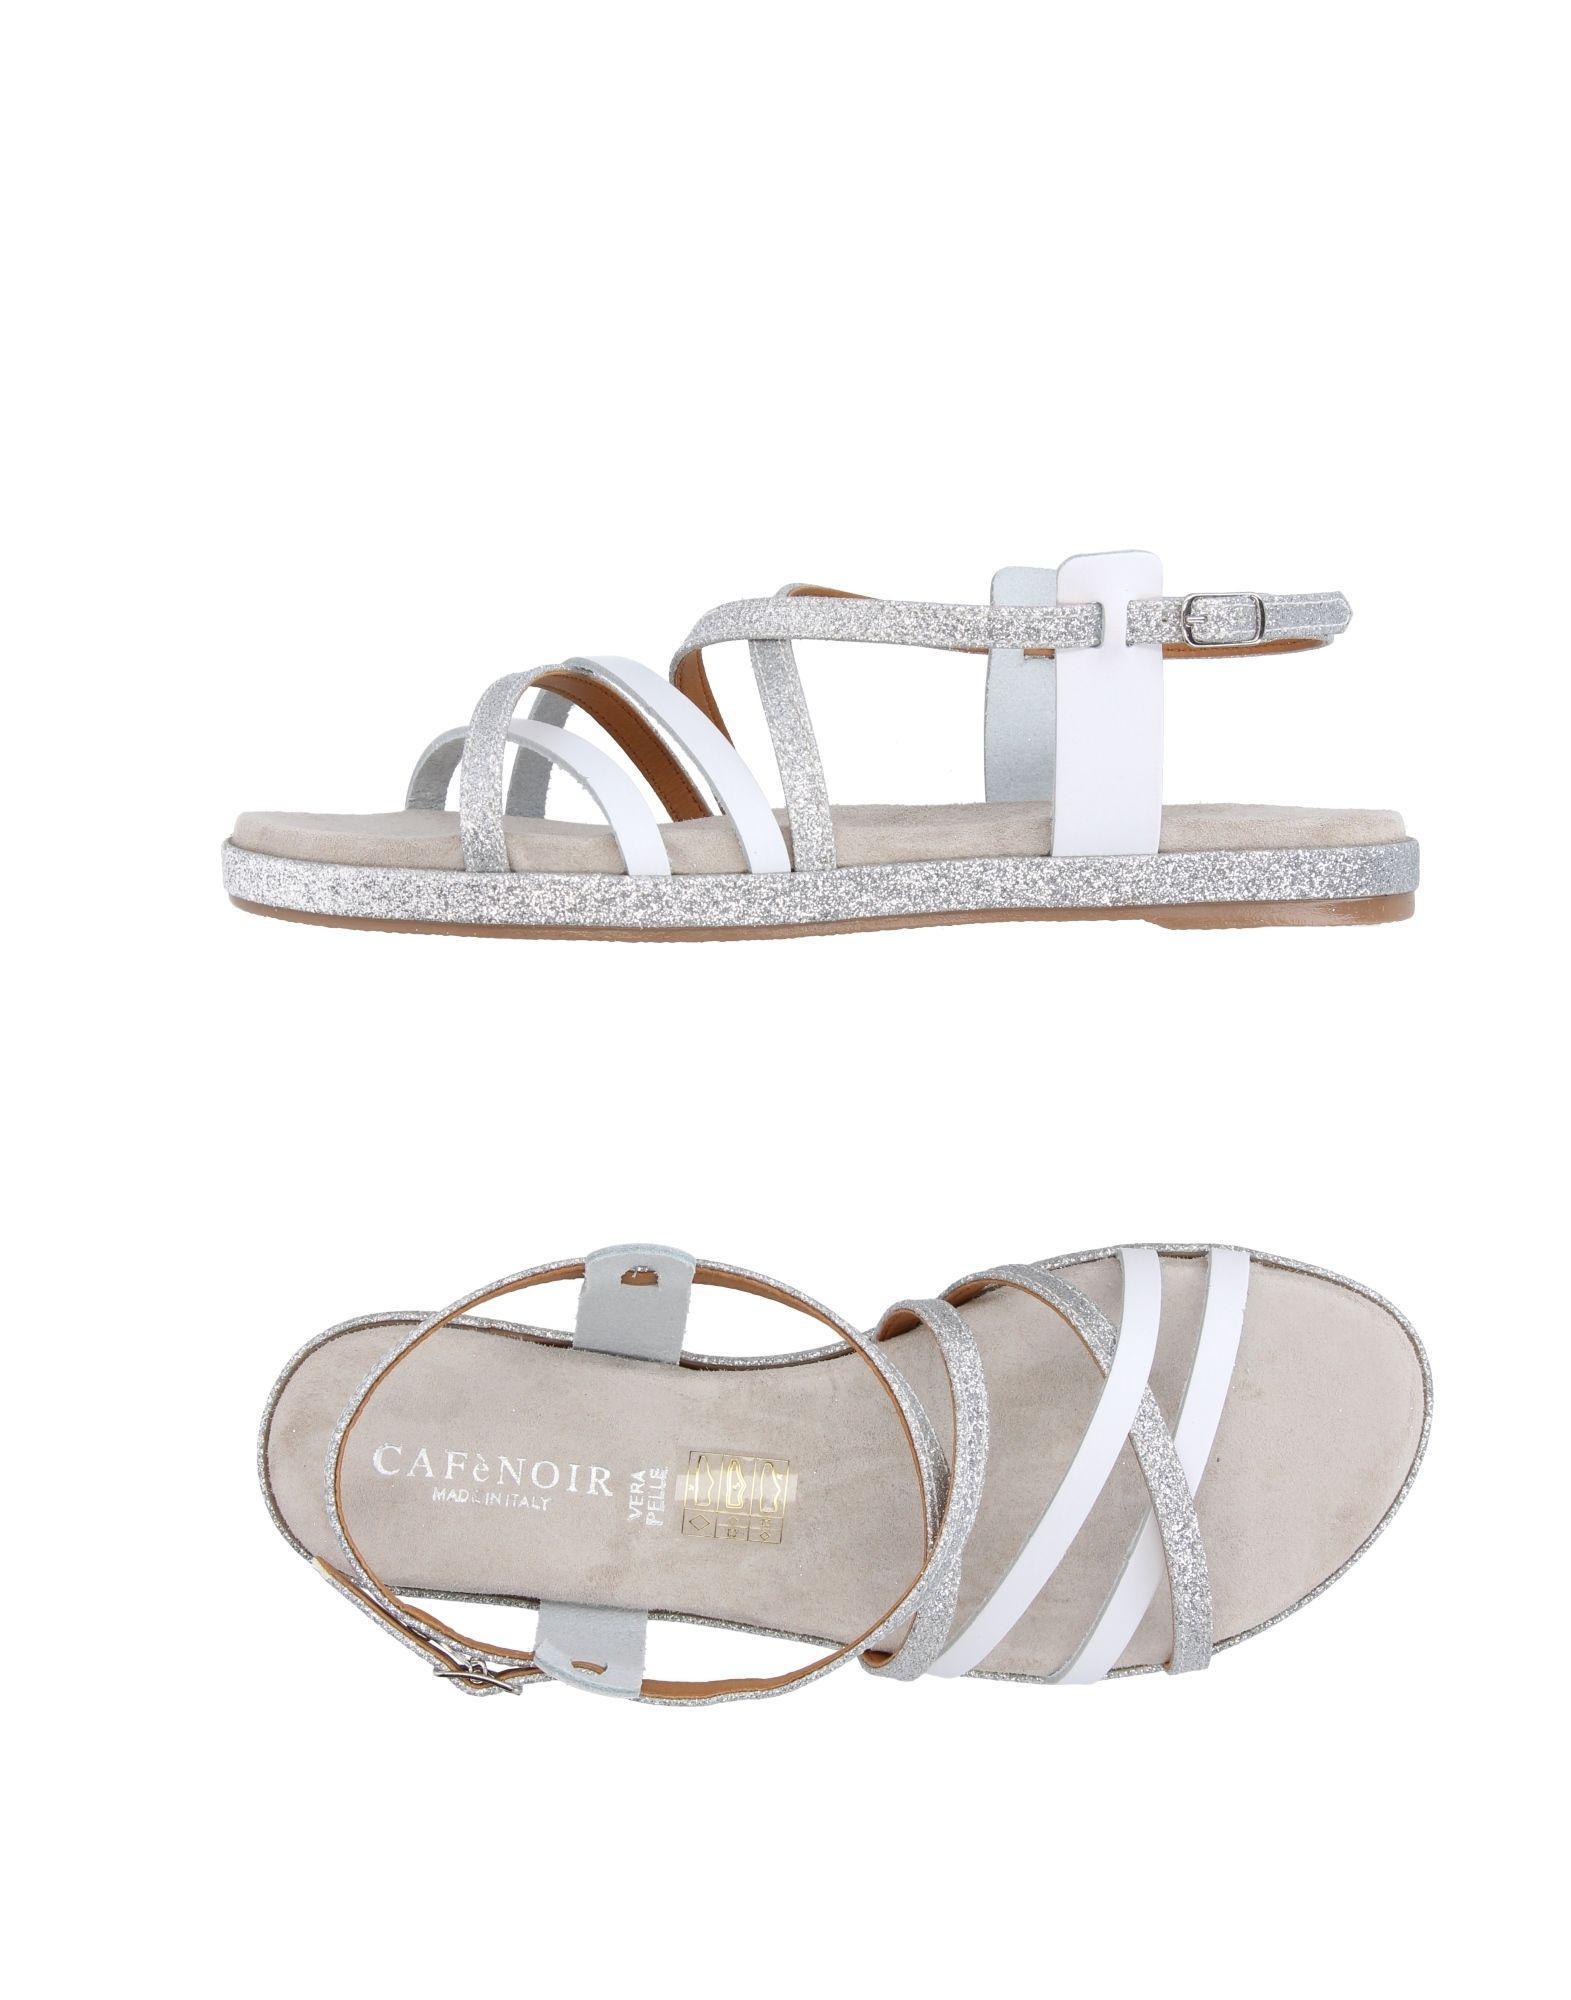 CafeNoir. Women's White Sandals